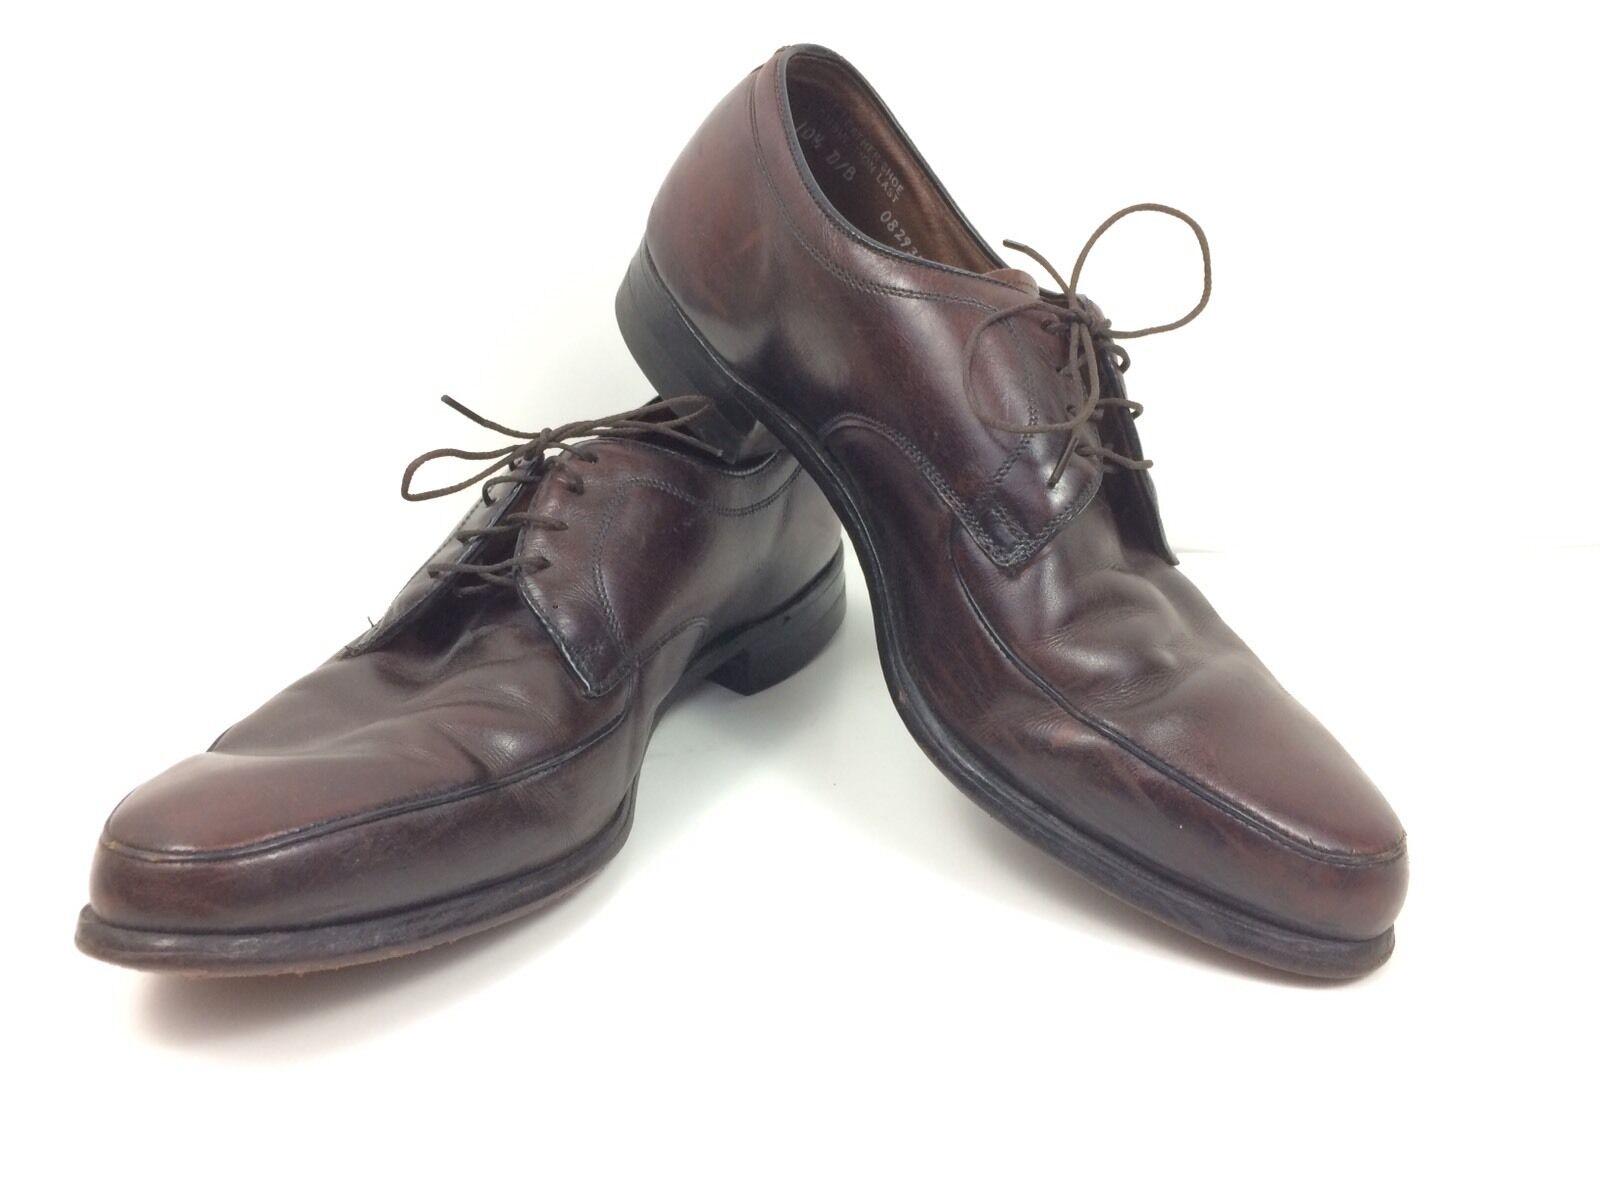 MENS Genuine Calfskin Leather Dress shoes 10 1 2 D B Combination Last Brown shoes